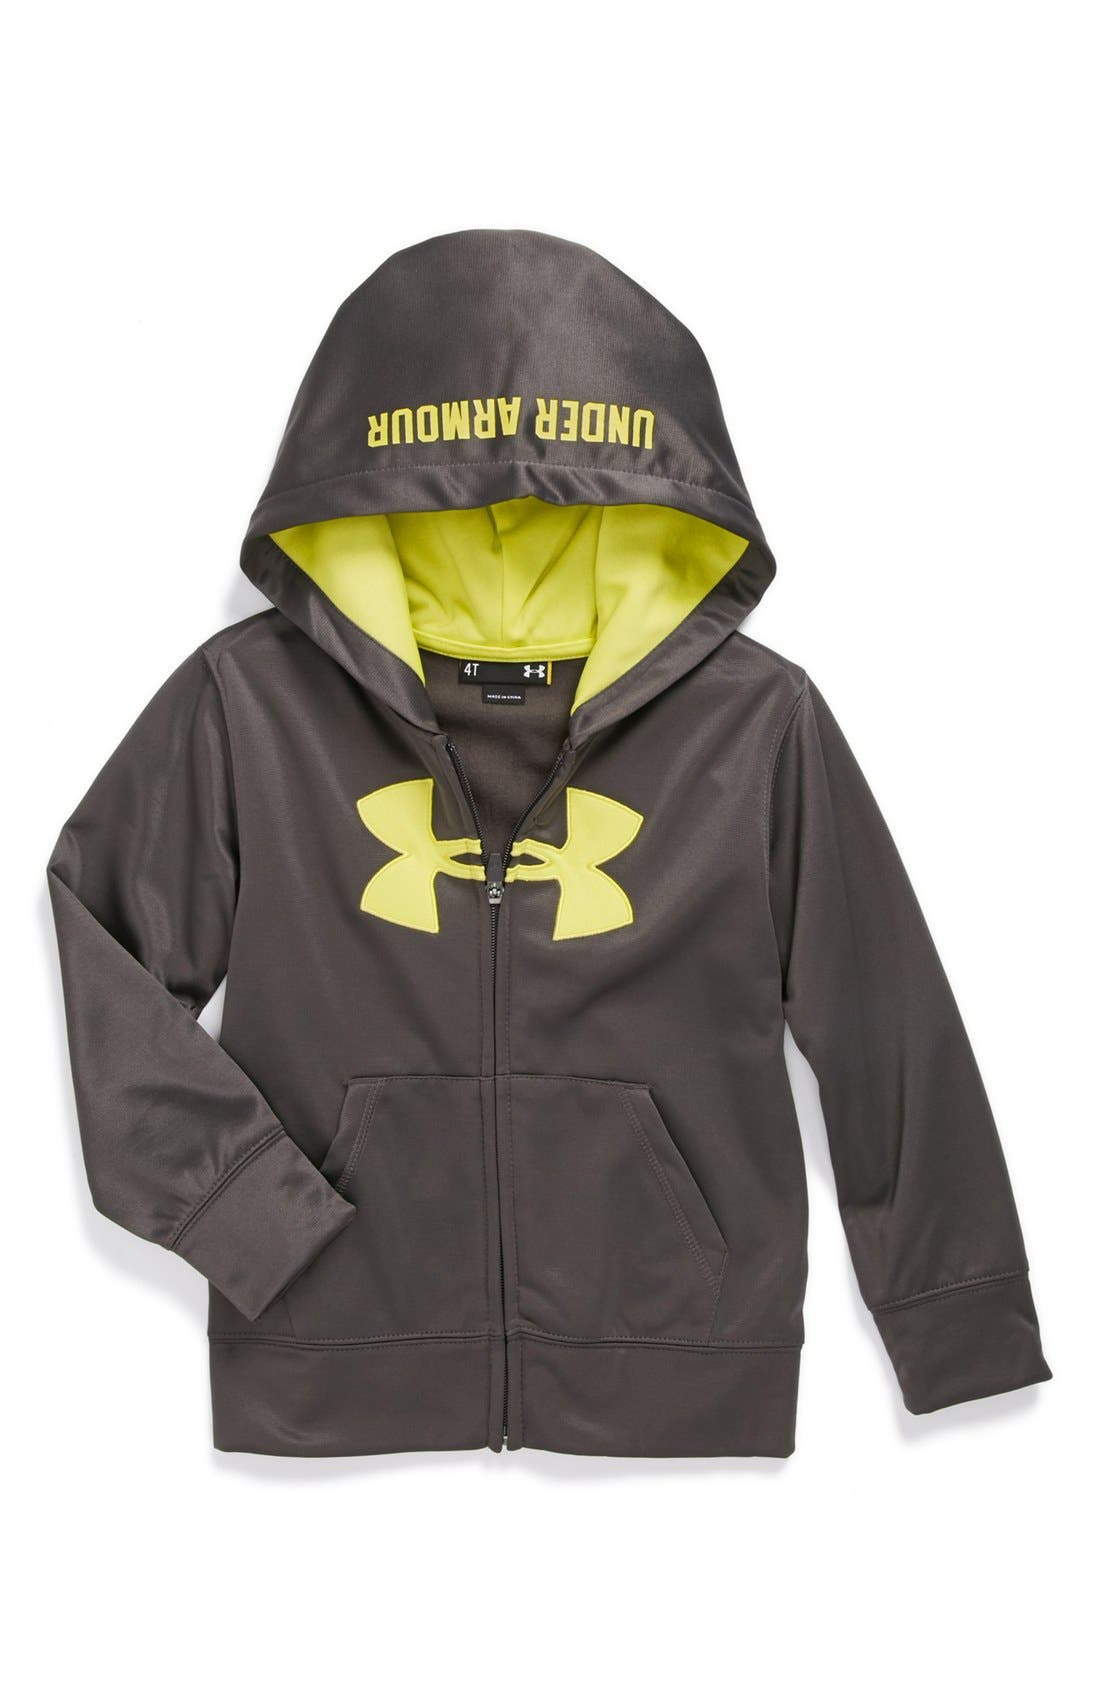 Alternate Image 1 Selected - Under Armour 'Big Logo' Hoodie (Toddler Boys)